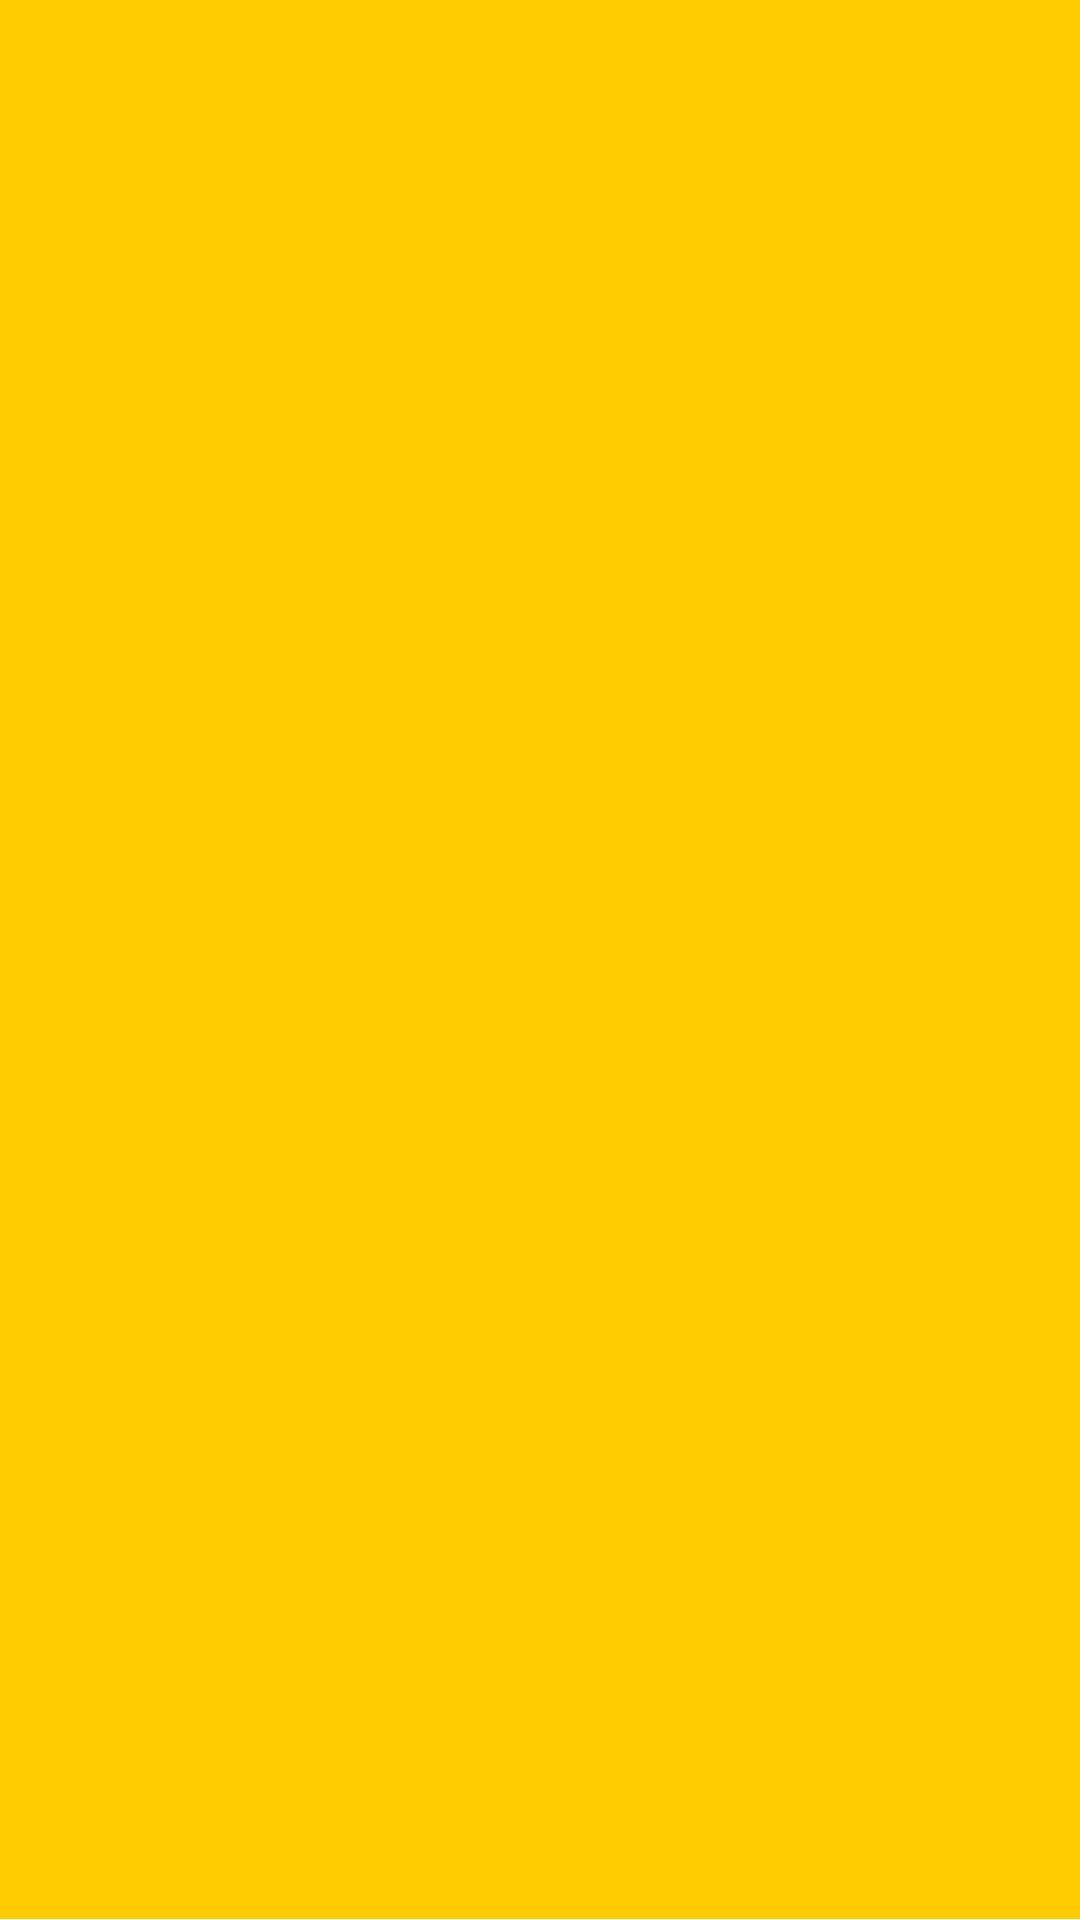 Pin Oleh Terrez Mcmuffin Di Wallpapers Warna Latar Belakang Kuning